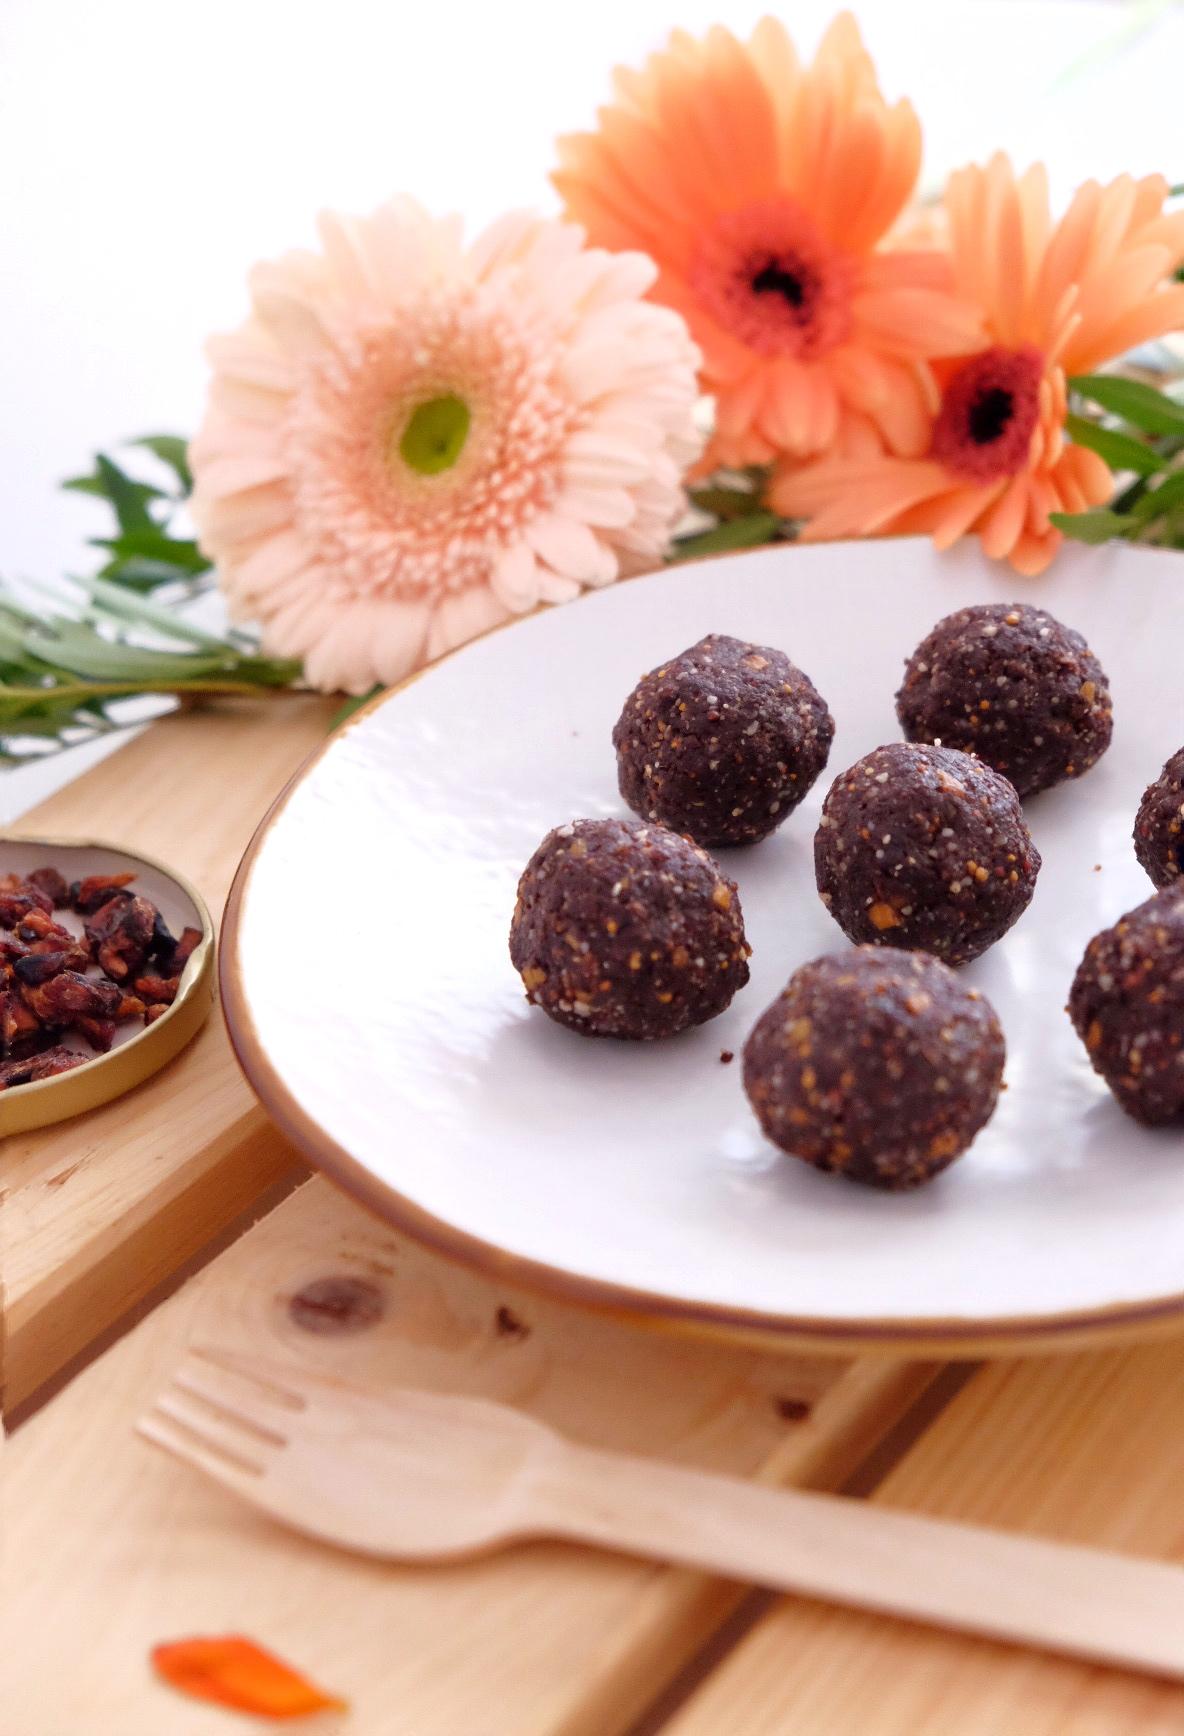 Las powers balls de chocolate sin gluten